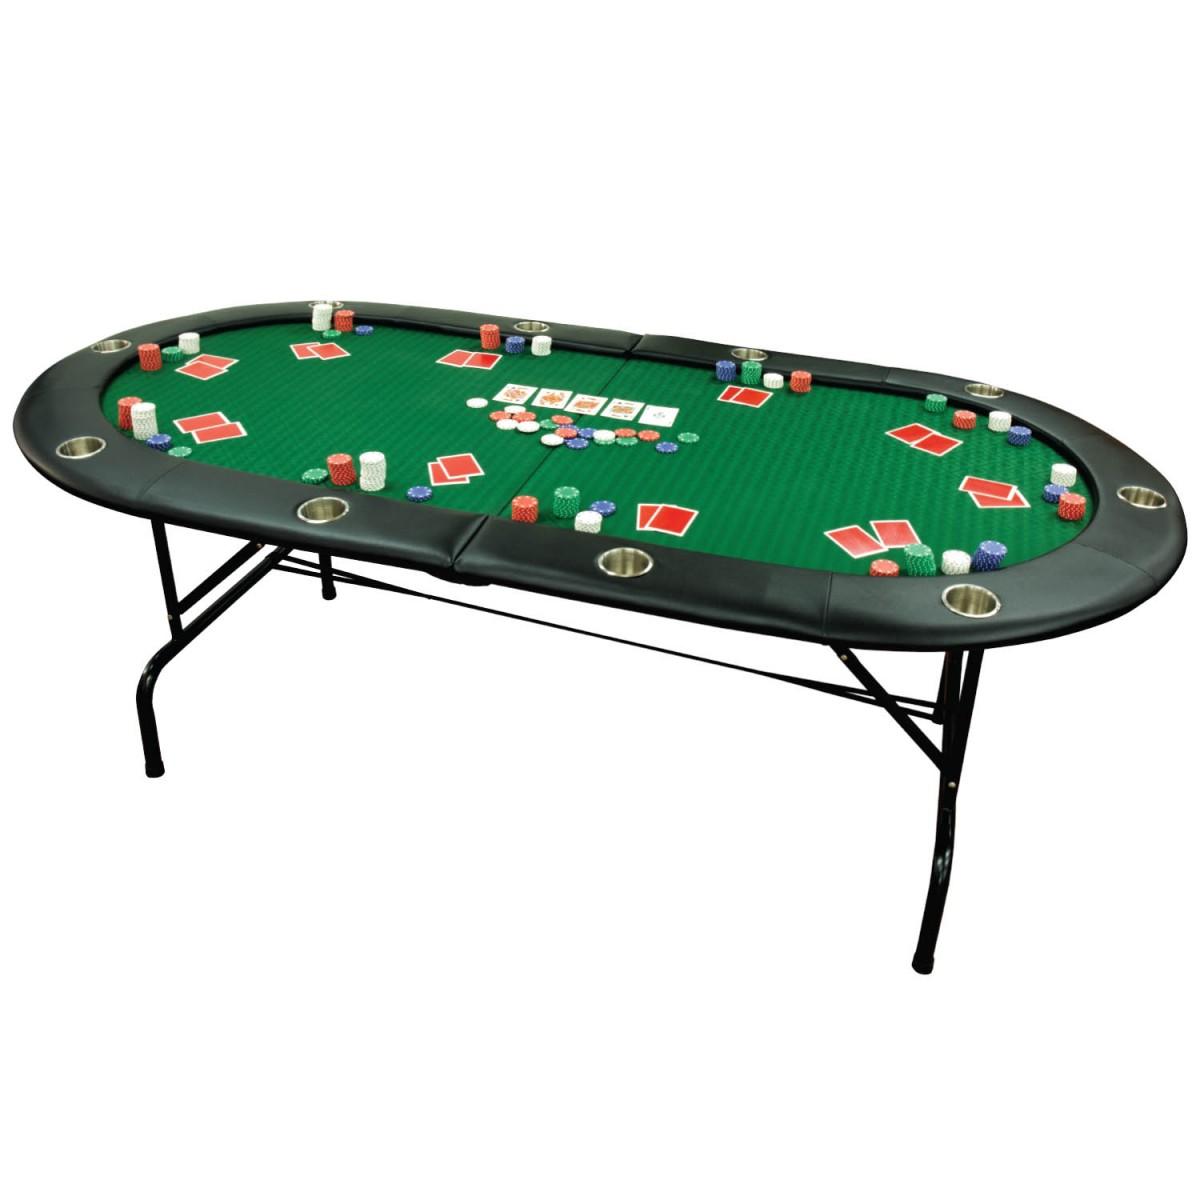 "ProPoker 9"" Foldable Texas Hold'em Poker Table"